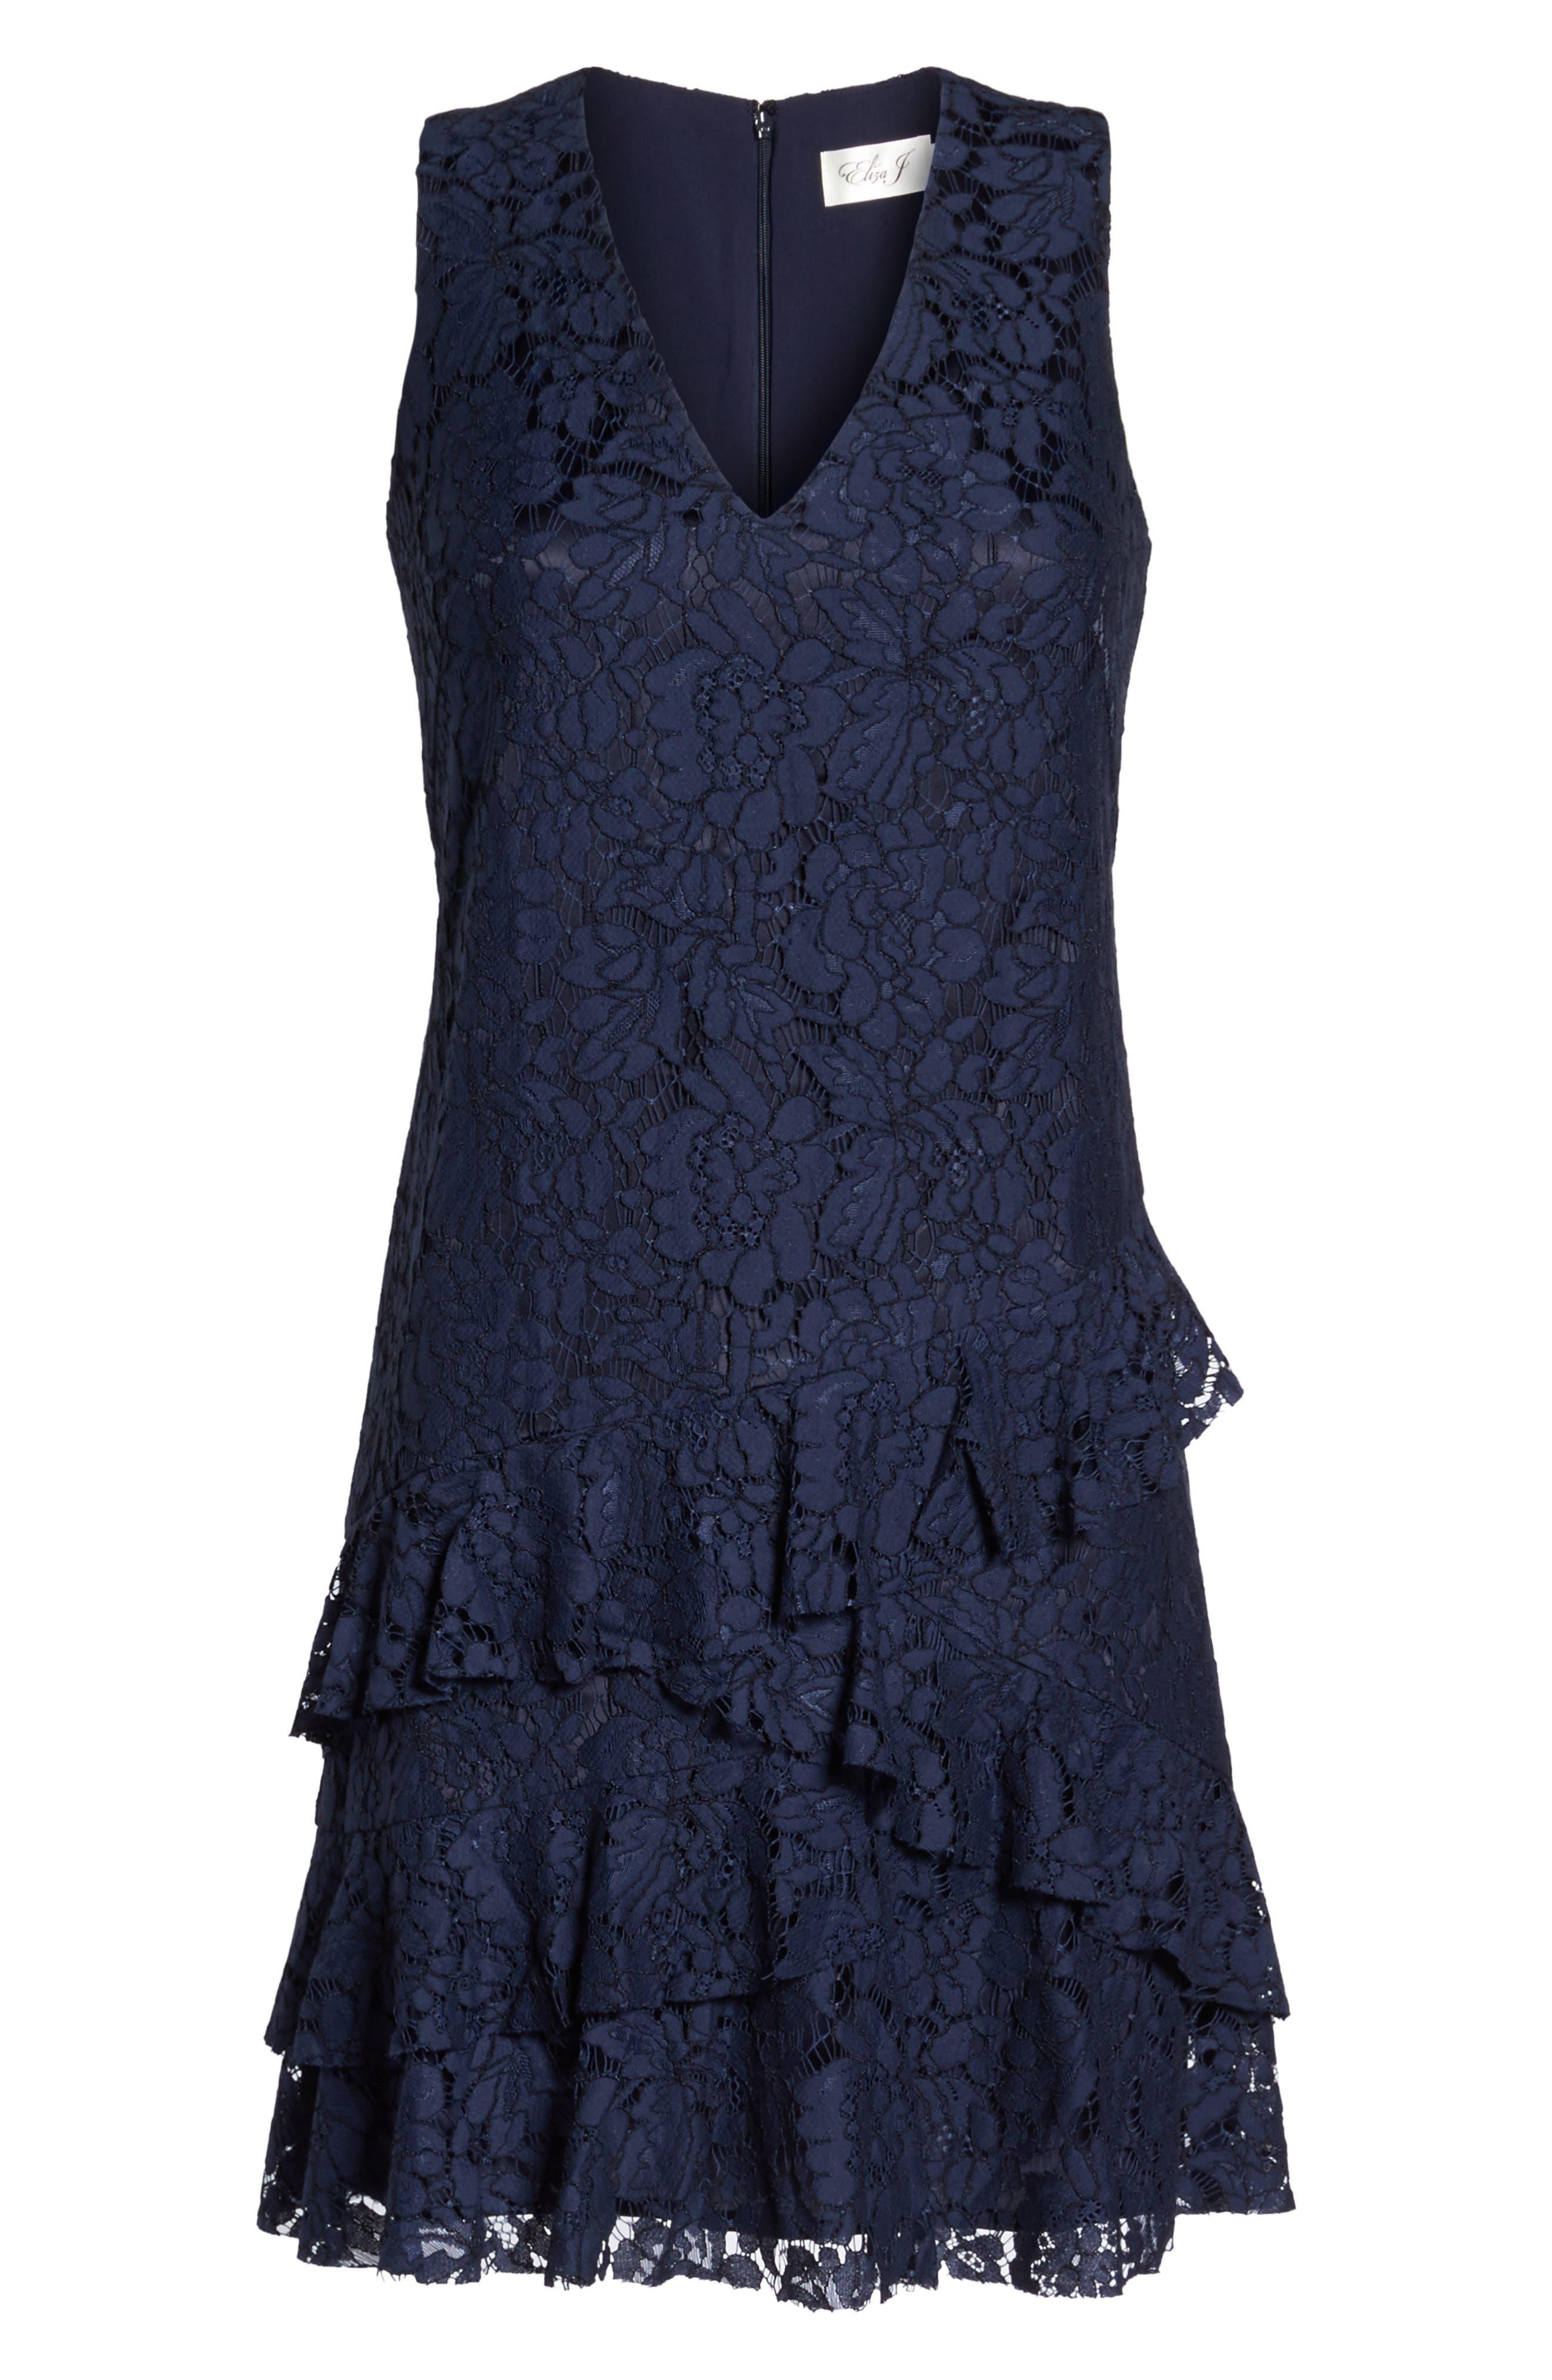 Ruffle Lace Shift Dress,                             Alternate thumbnail 6, color,                             410